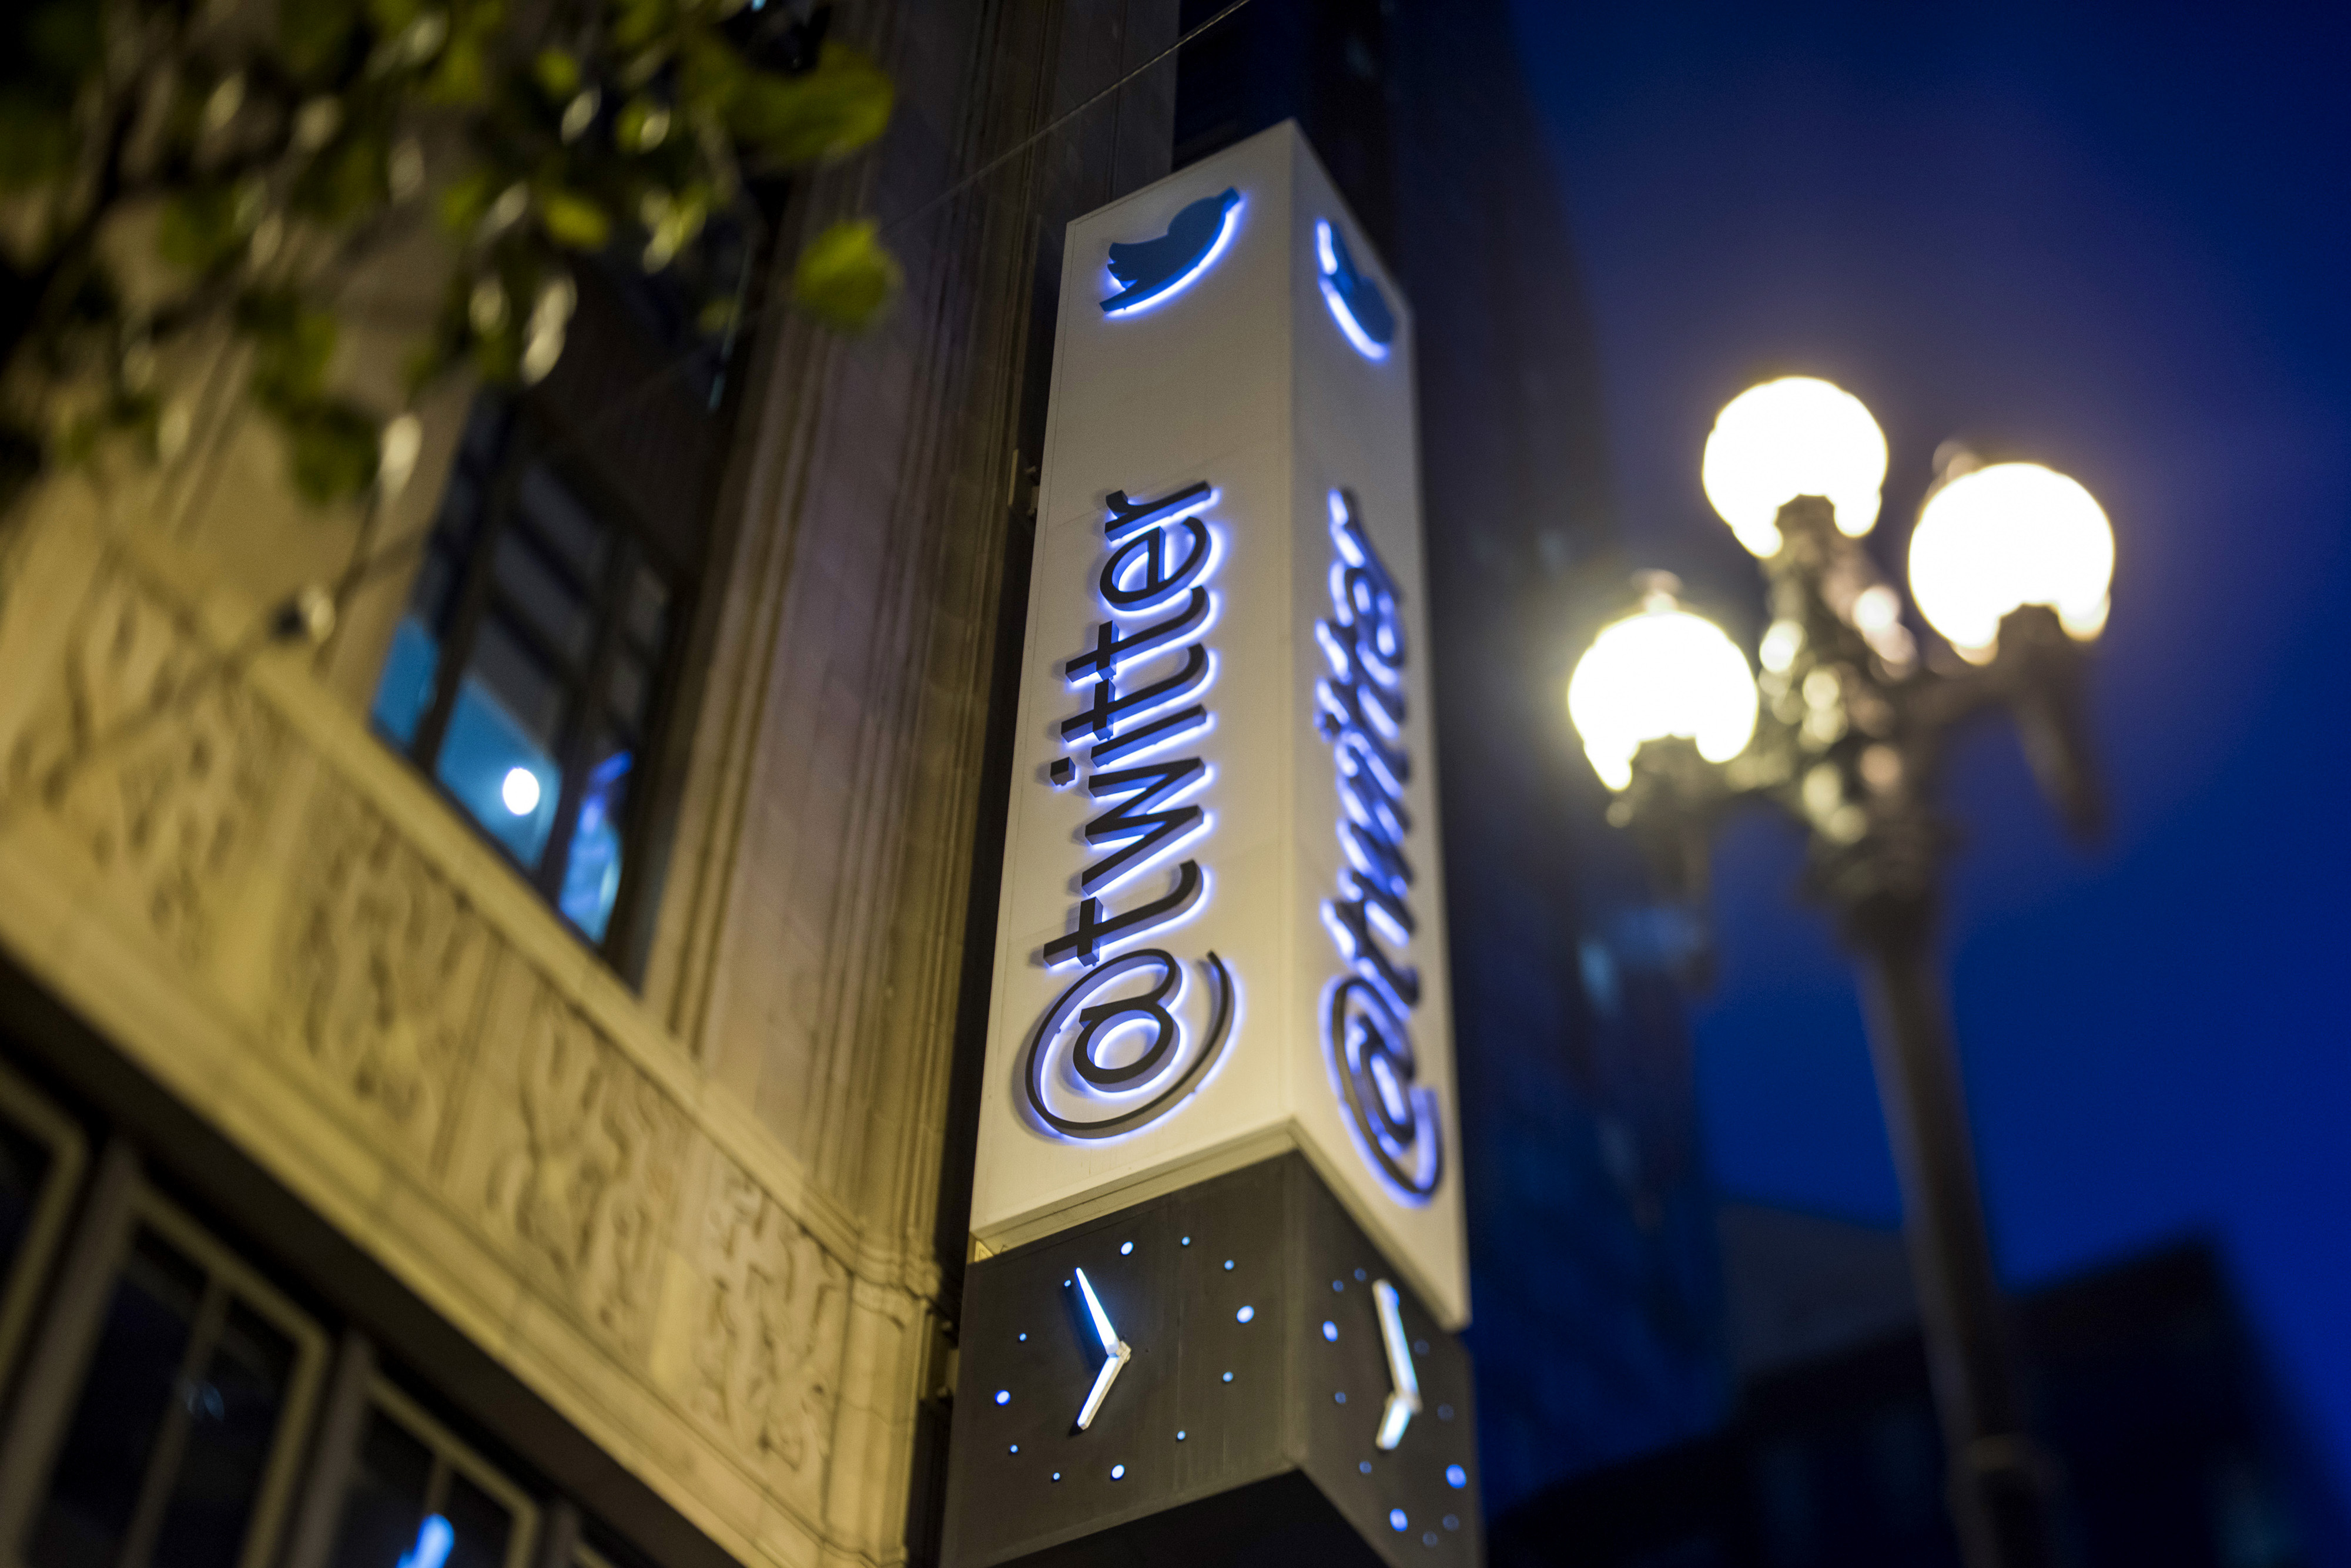 Twitter Inc. Headquarters Ahead Of Earnings Figures